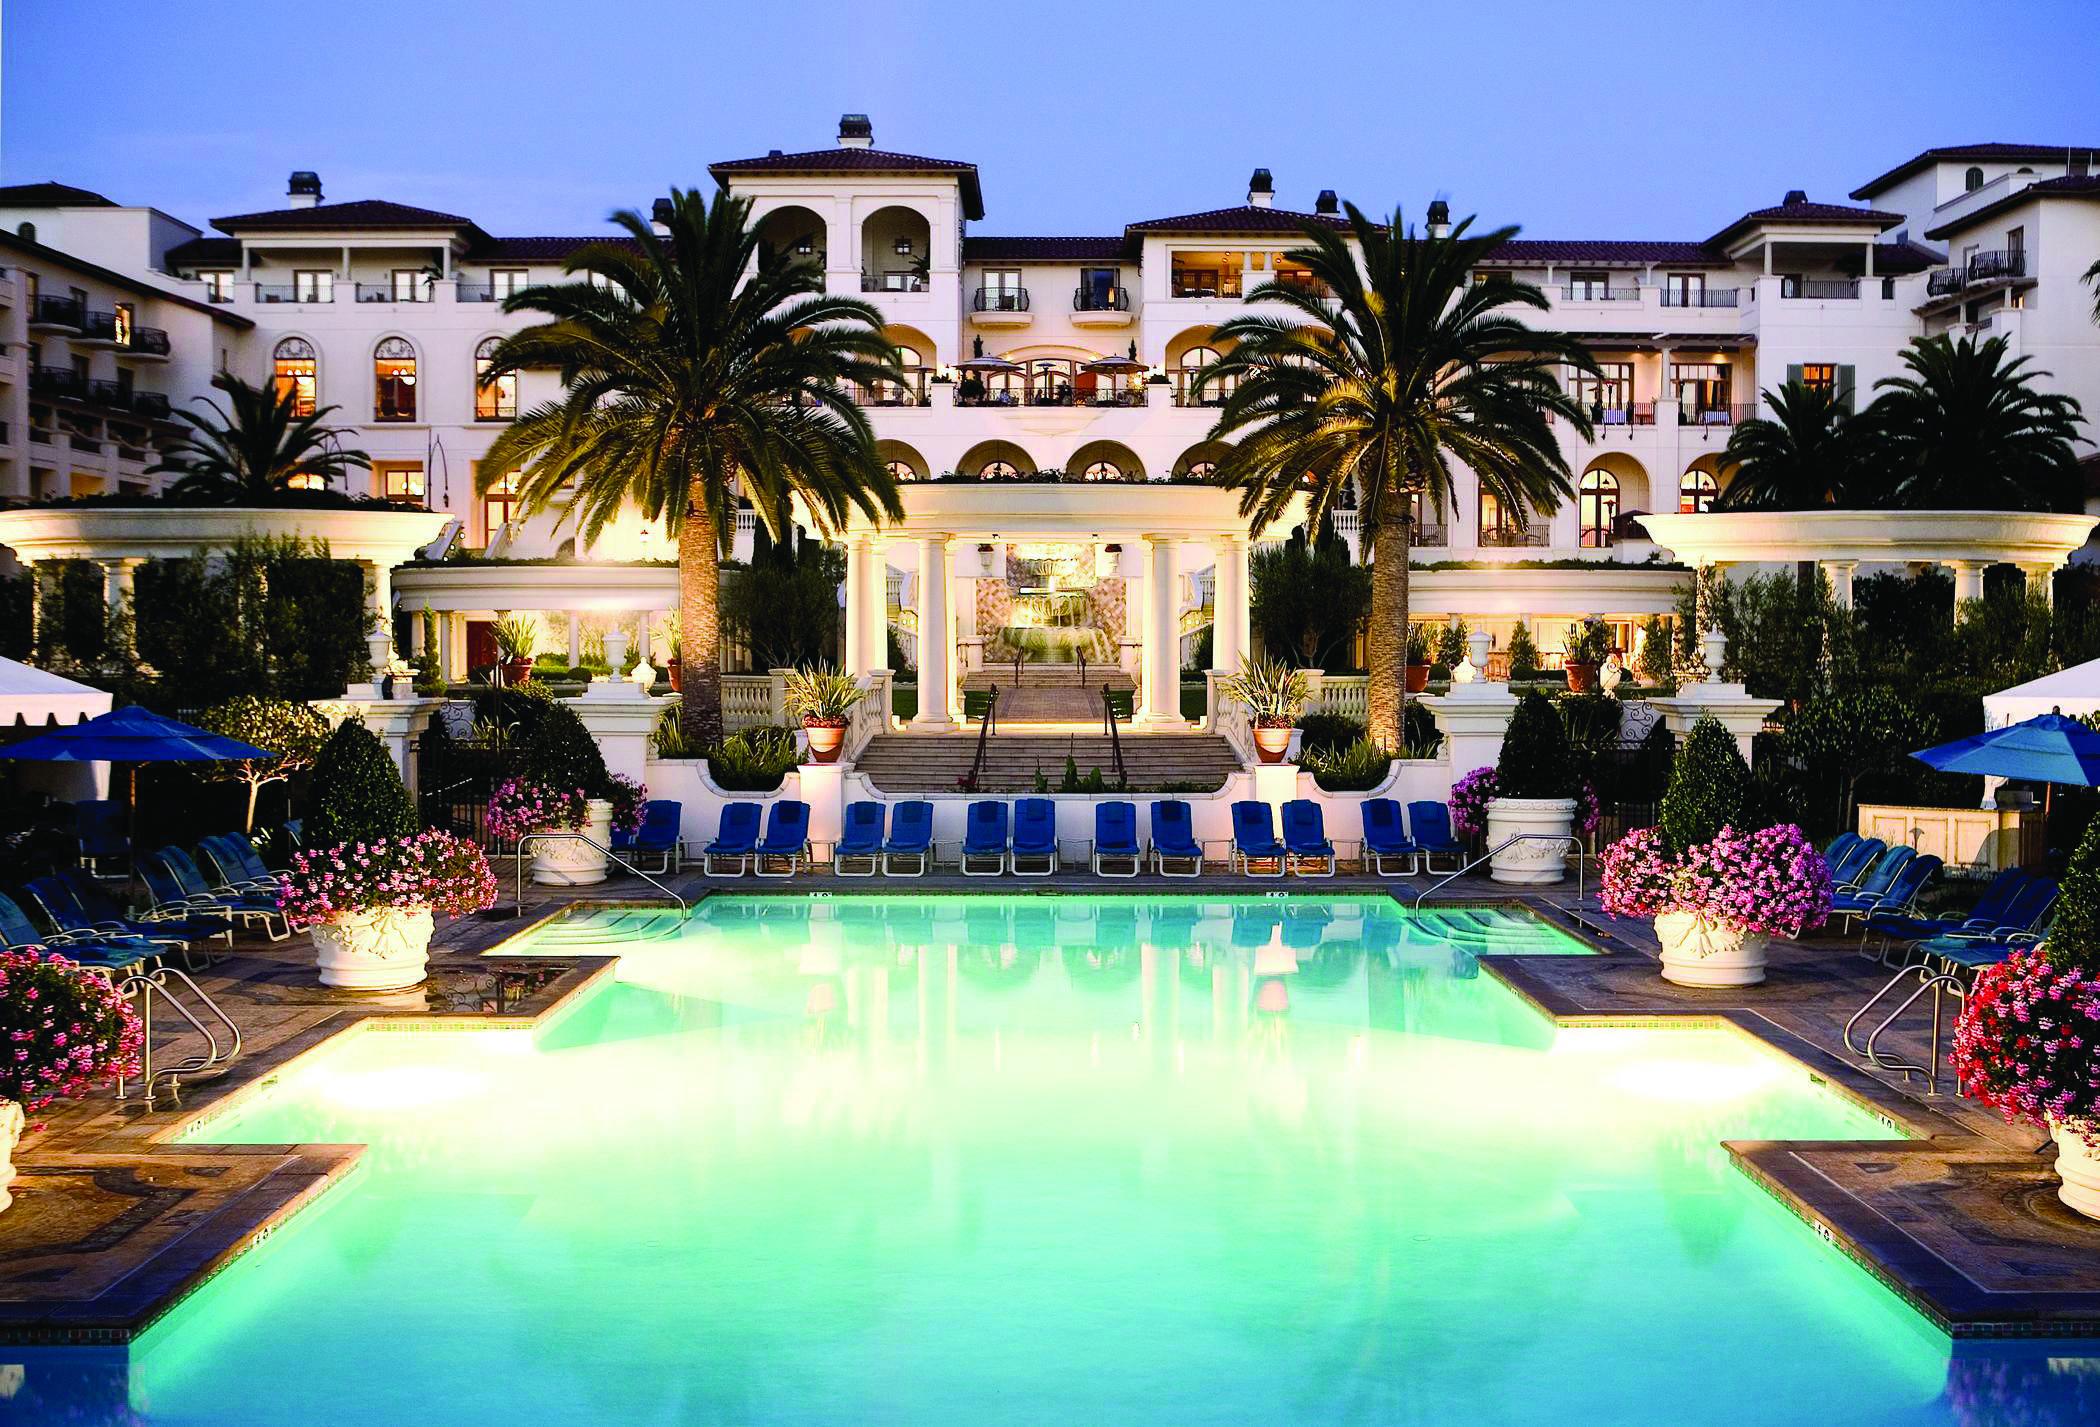 top 5 hotel pools in los angeles & orange county